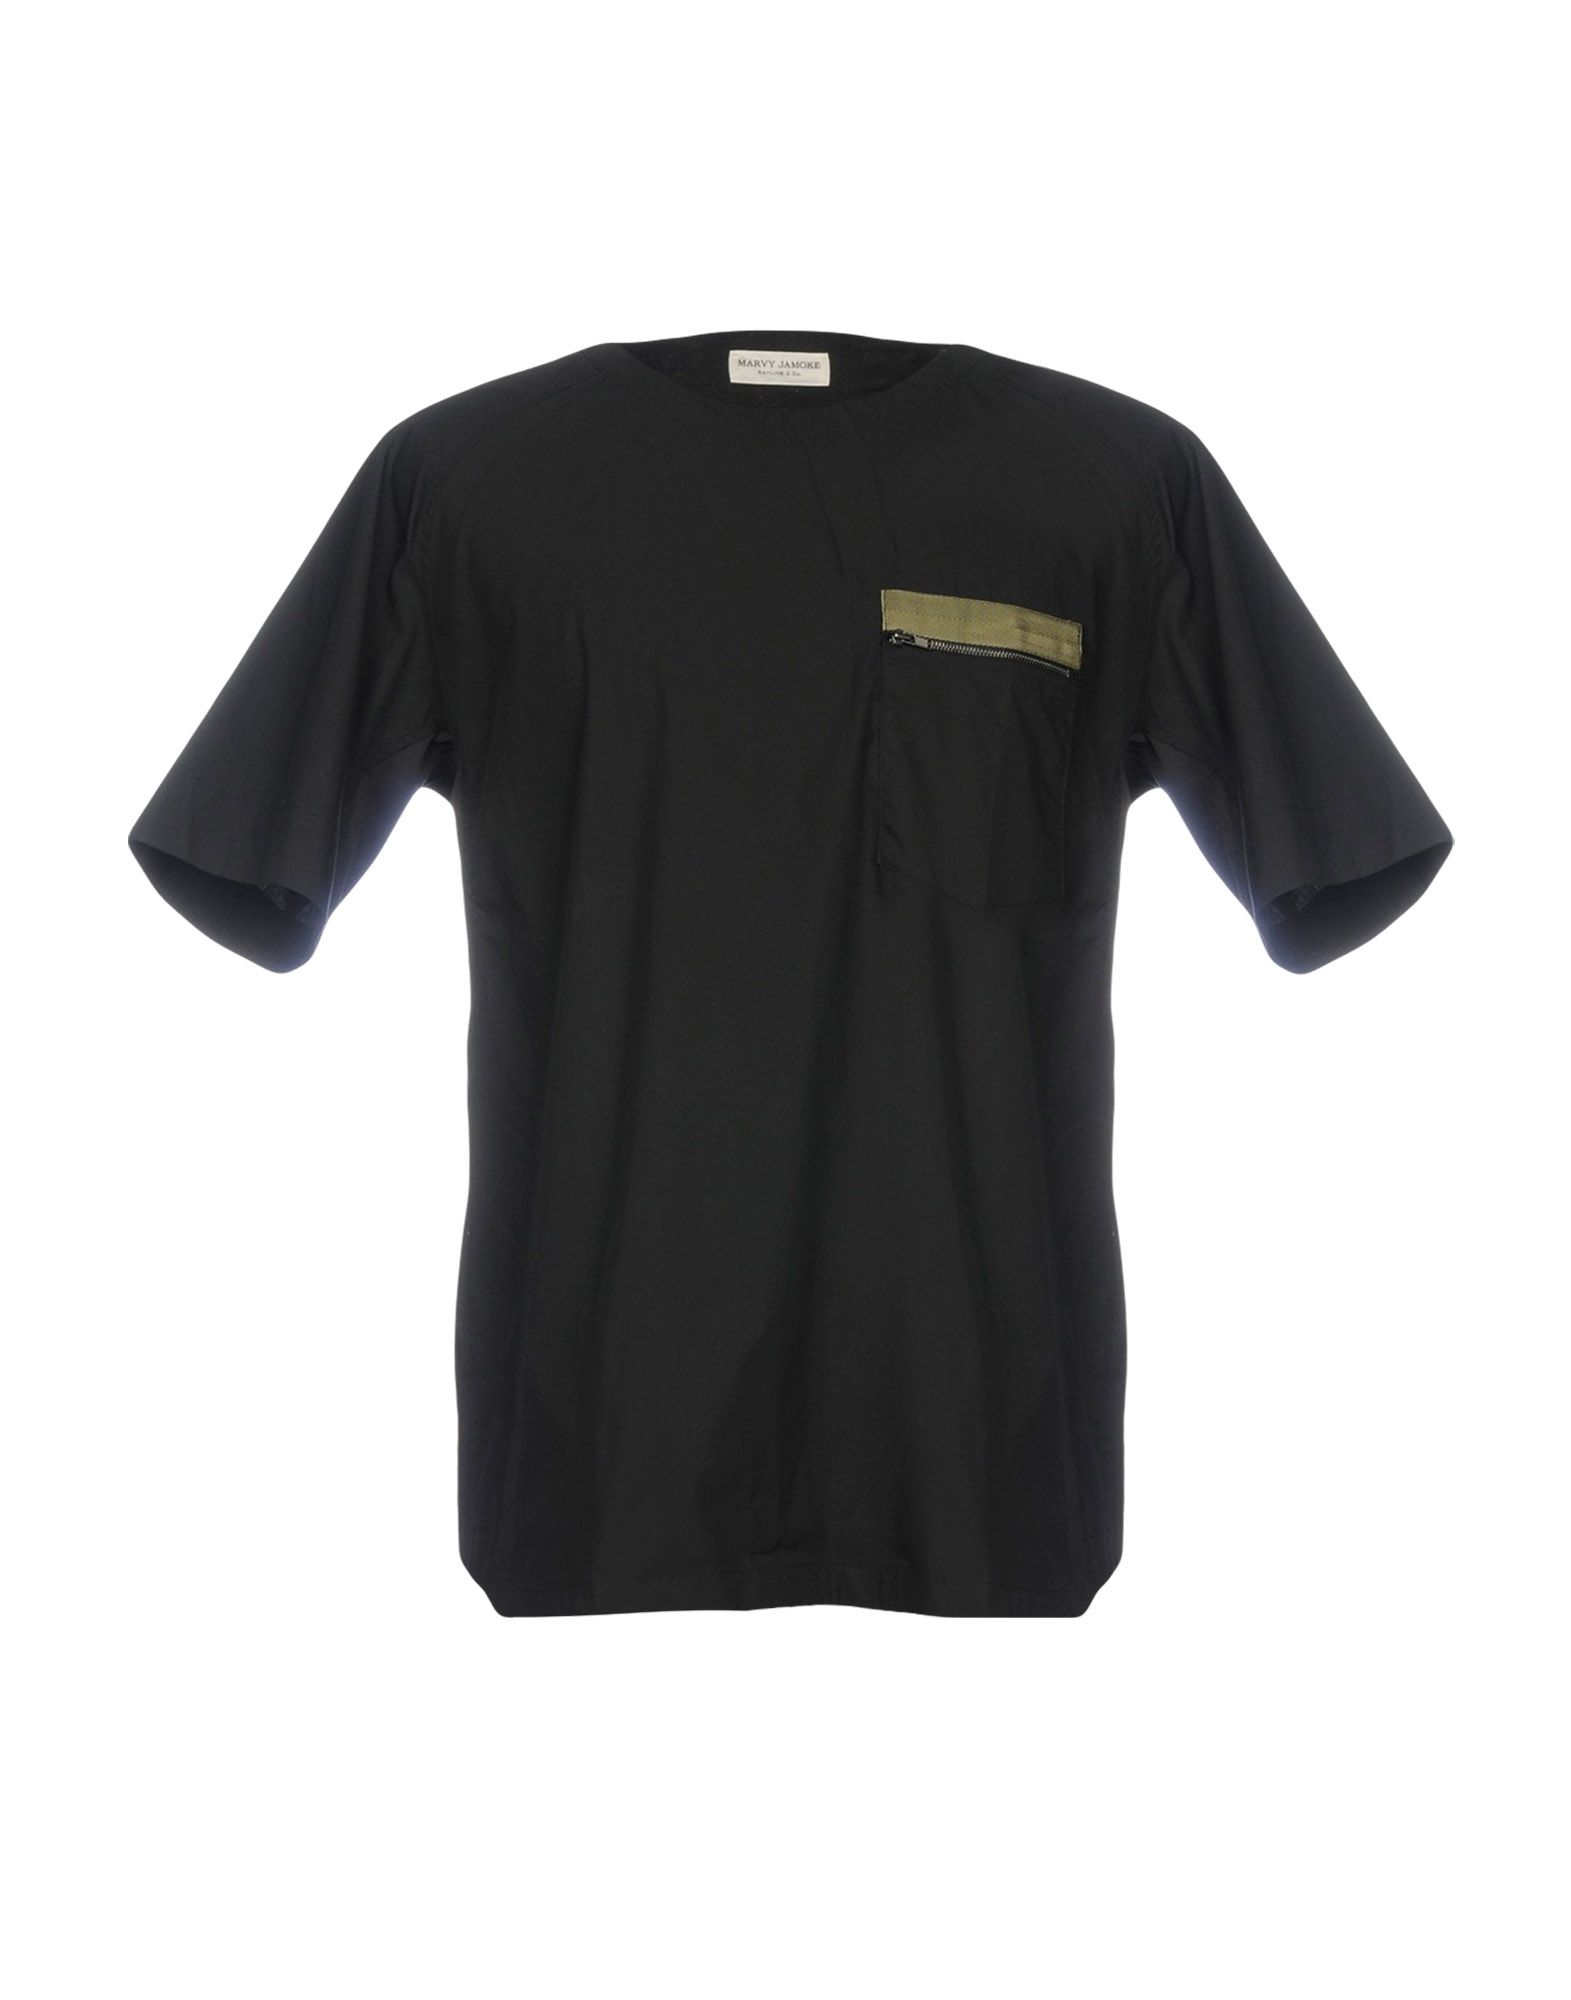 MARVY JAMOKE Solid Color Shirt in Black